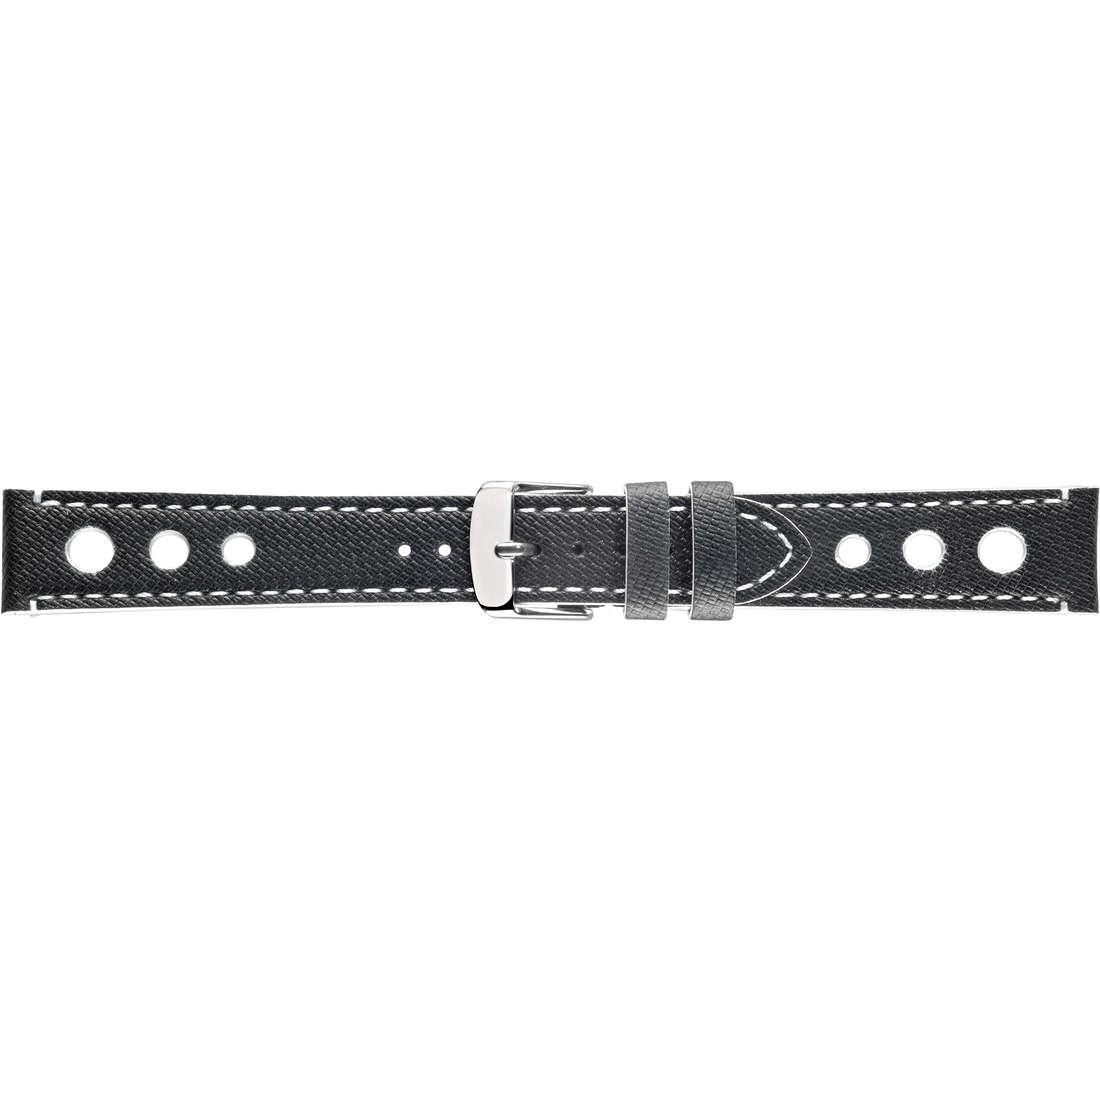 watch watch bands watch straps man Morellato Linea Sport A01X4498B24817CR18